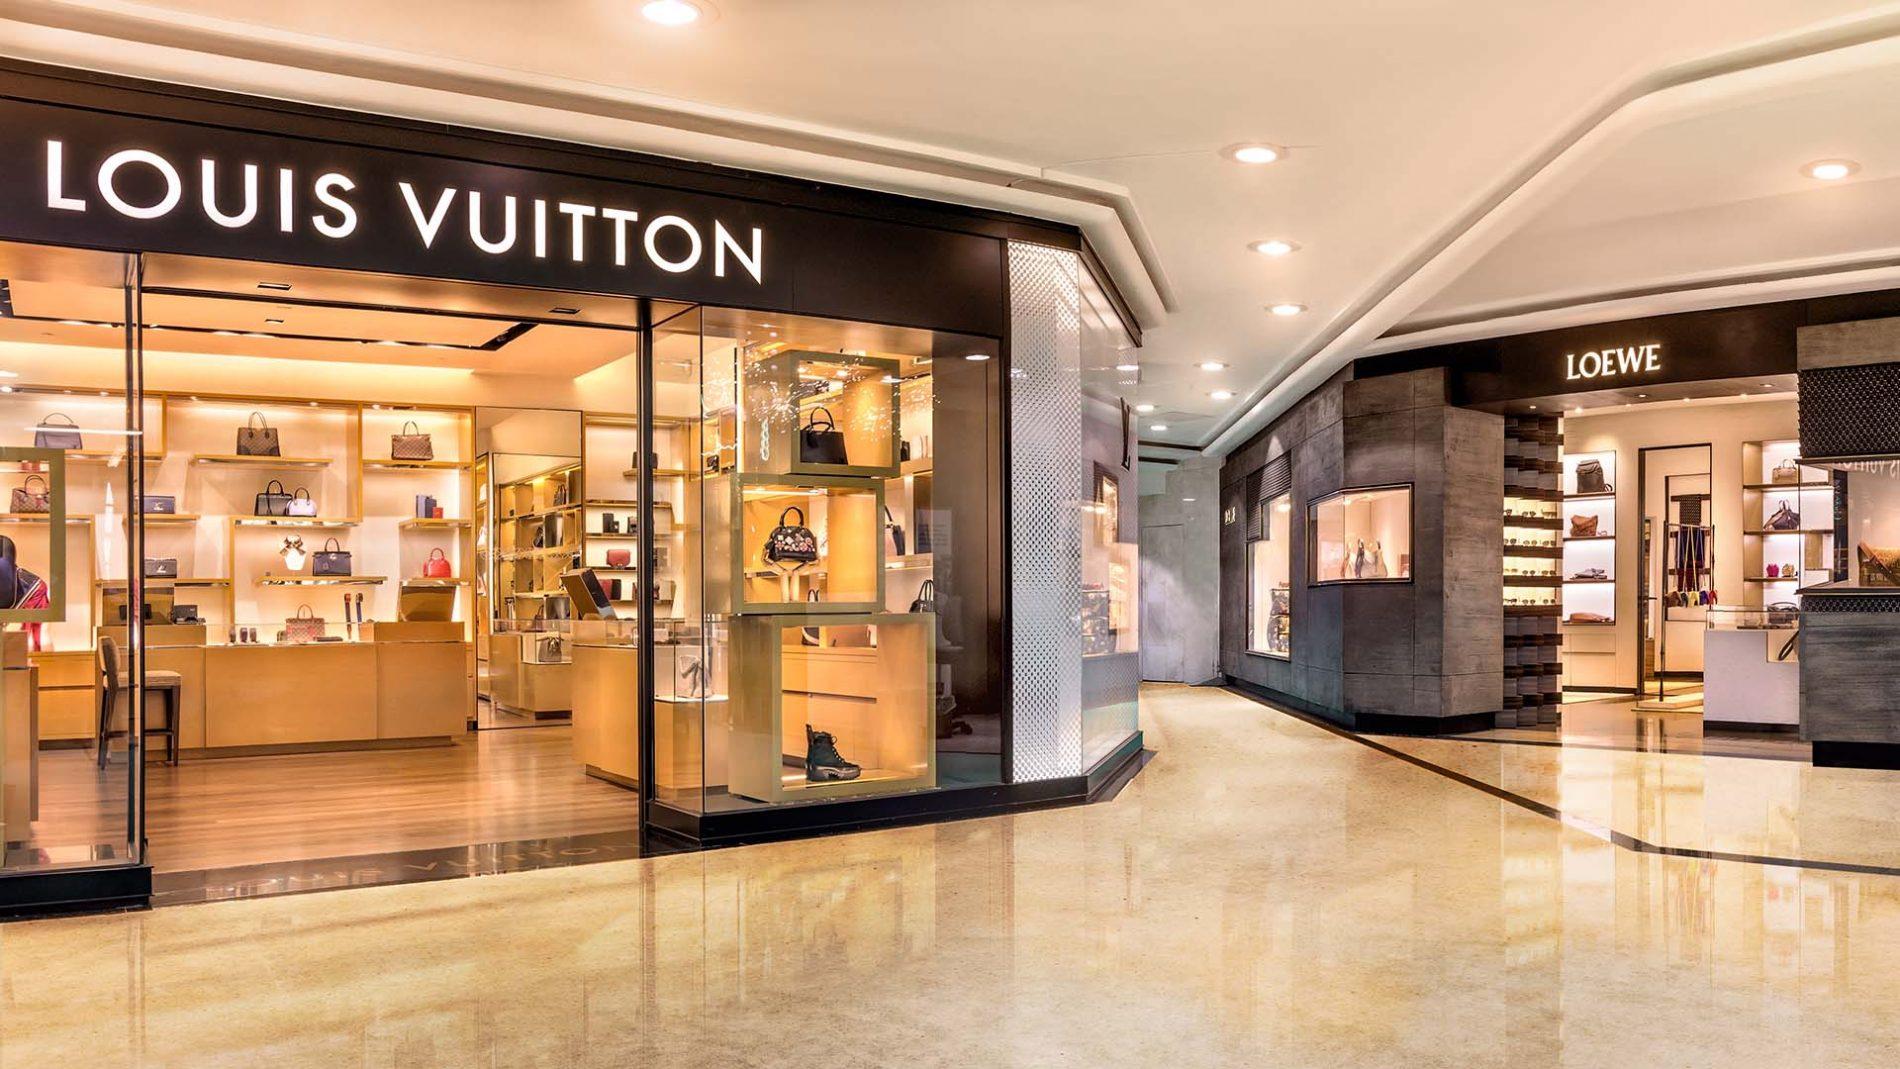 El Corte Inglés Diagonal Store Louis Vuitton Loewe